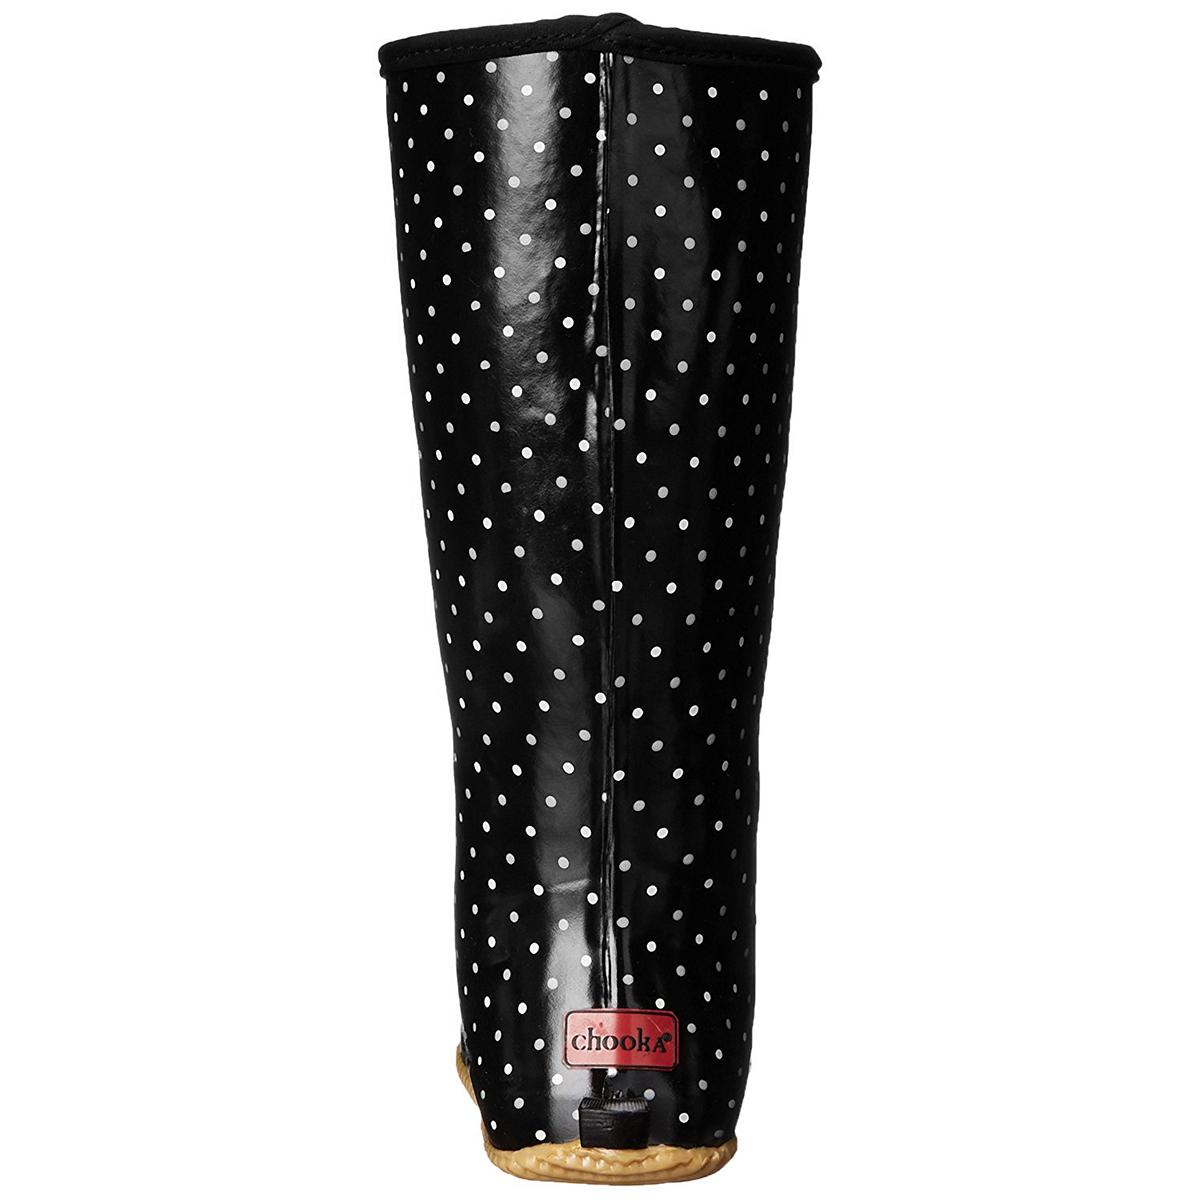 Chooka-Women-039-s-Rubber-Rain-Boots-Mid-Calf-With-Lightweight-Packable-Travel-Bag thumbnail 18